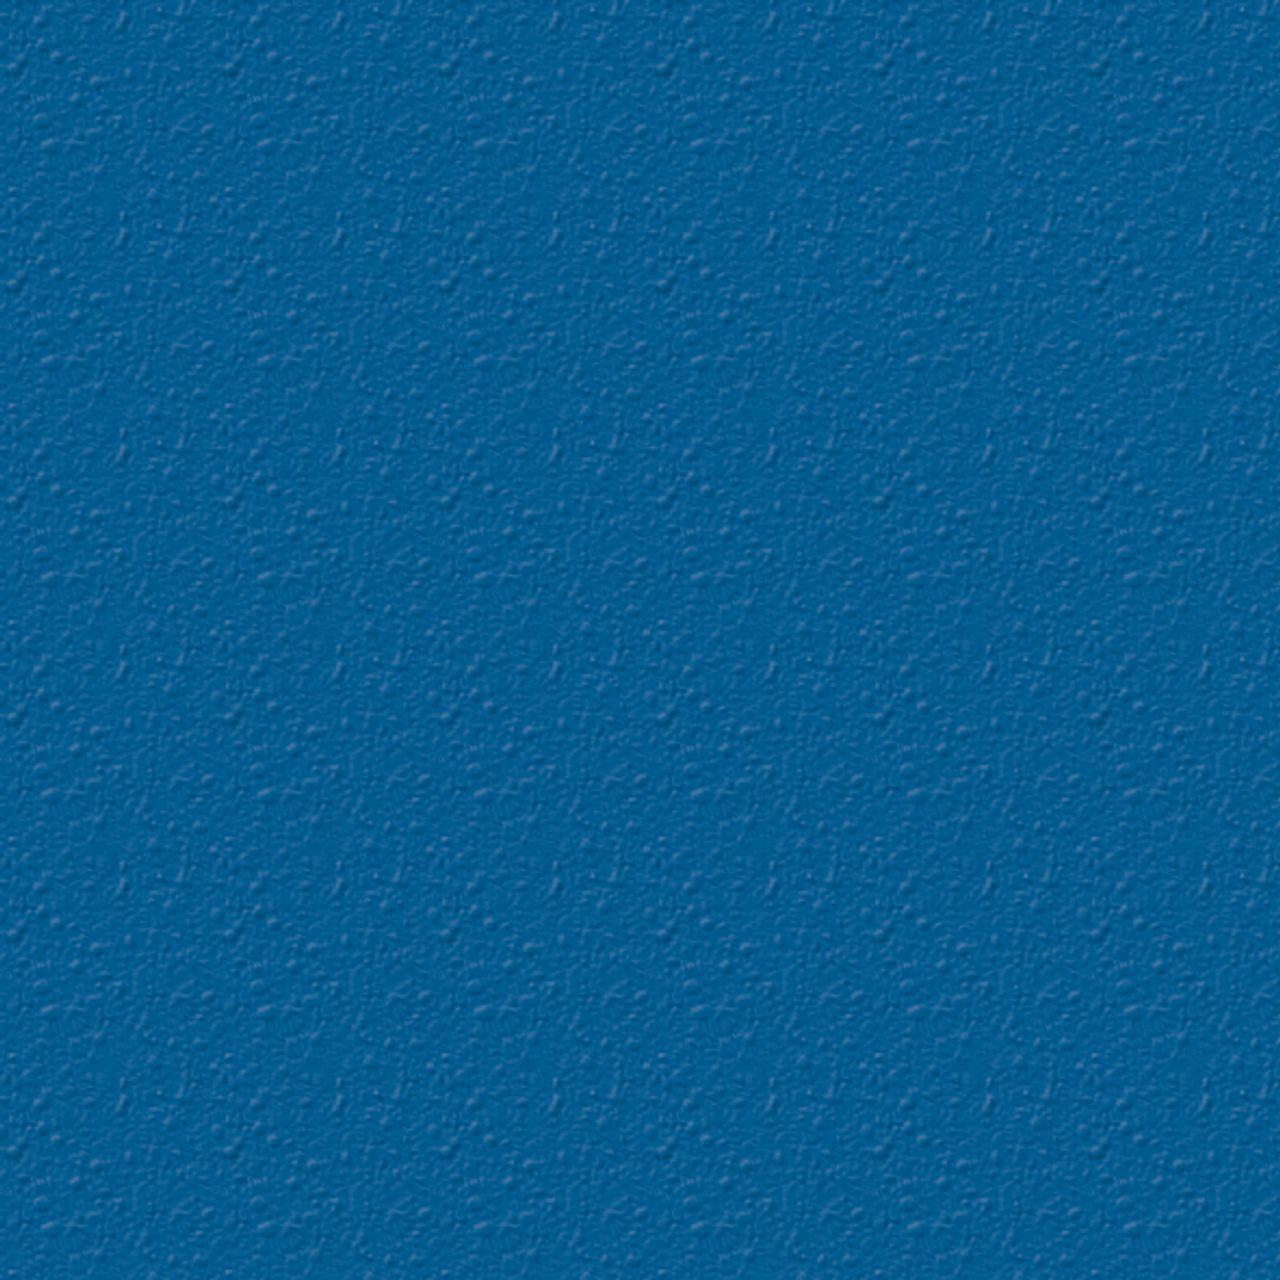 K22.4.4 Brilliant Blue